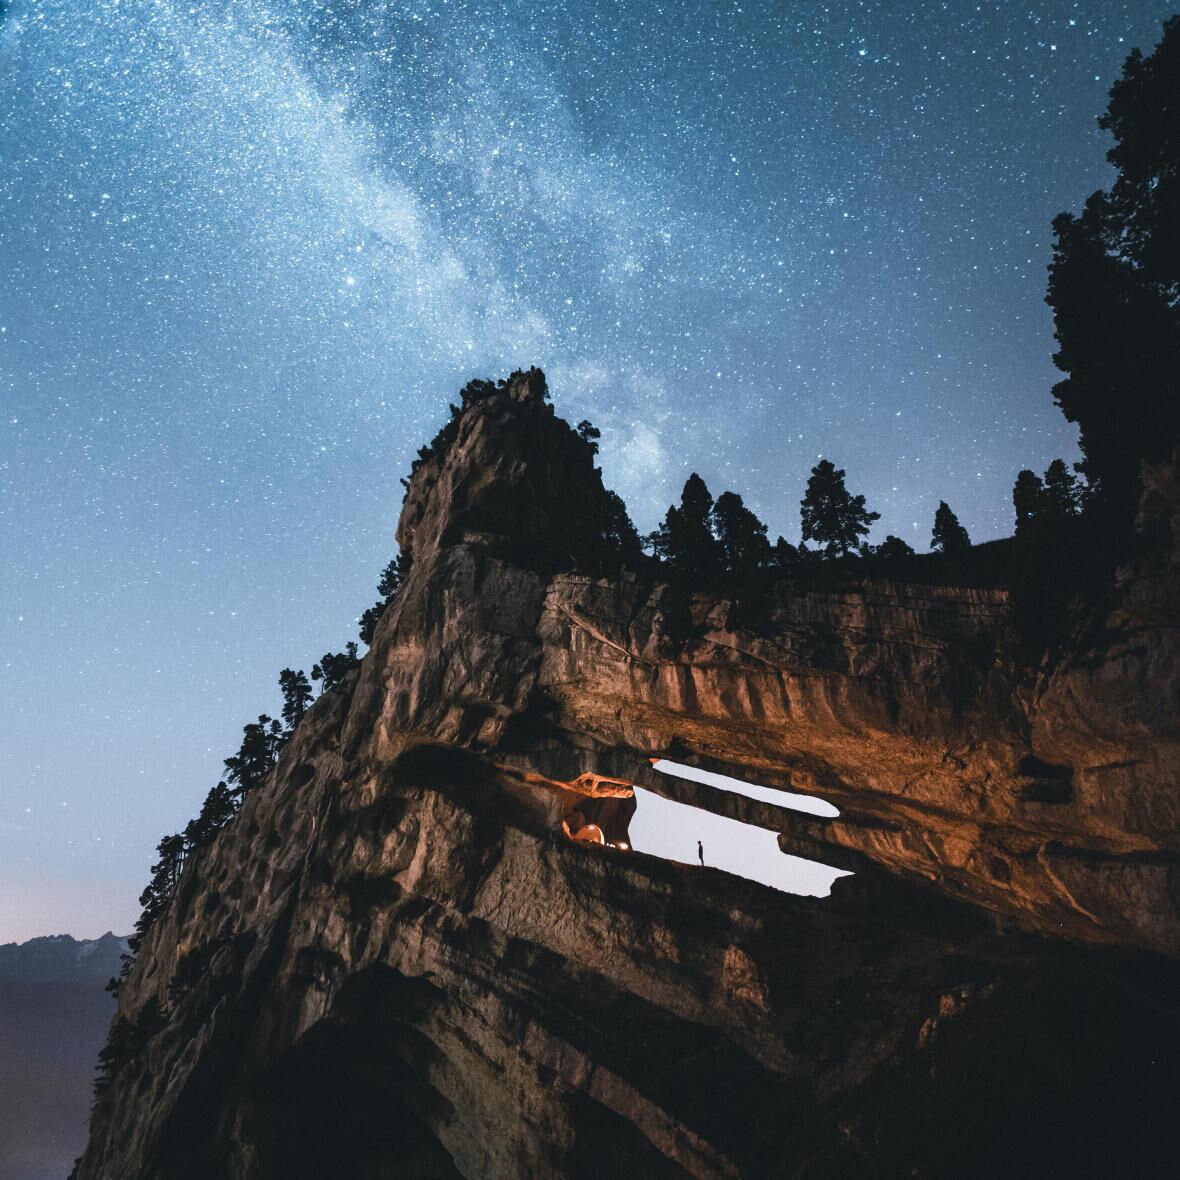 HOW TO TAKE NIGHT PHOTOS?